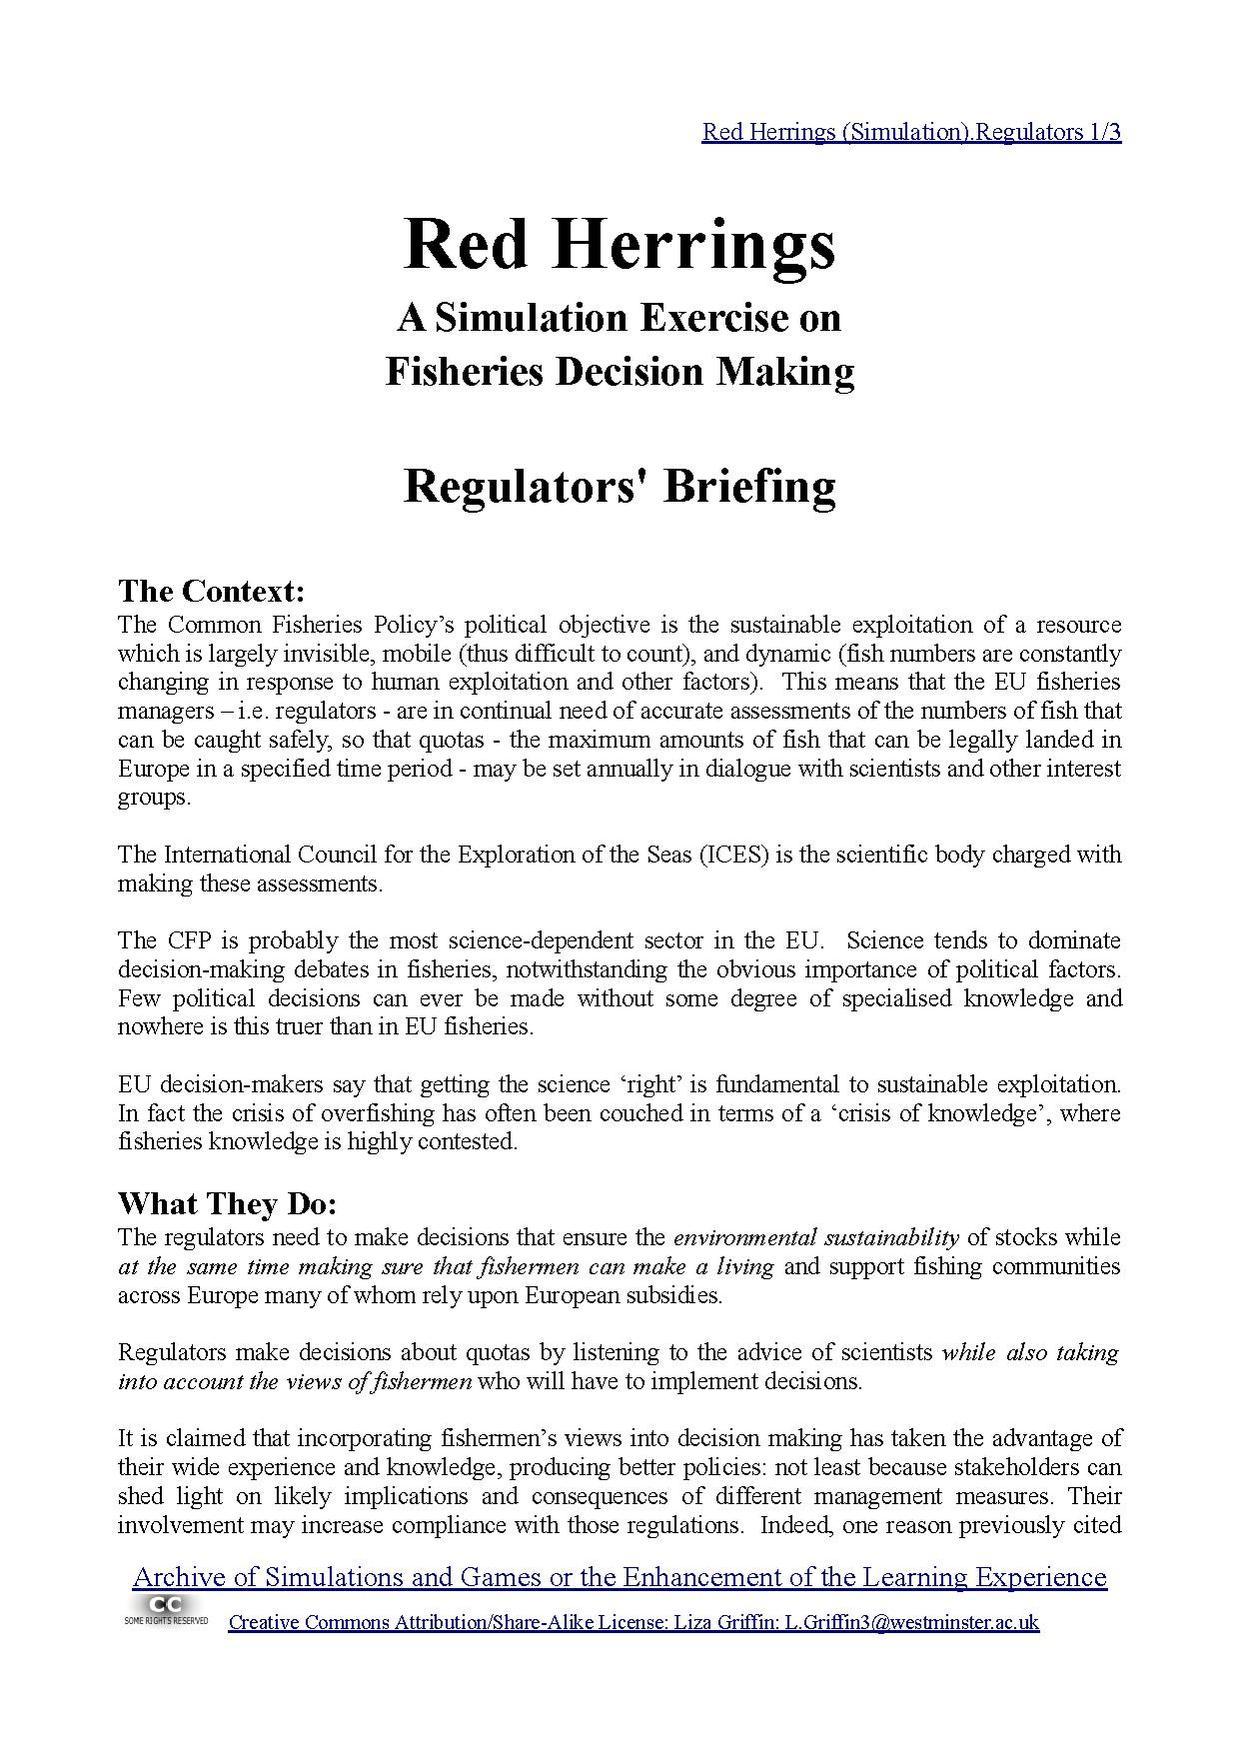 File:Red Herrings (Simulation) Regulators pdf - Wikiversity